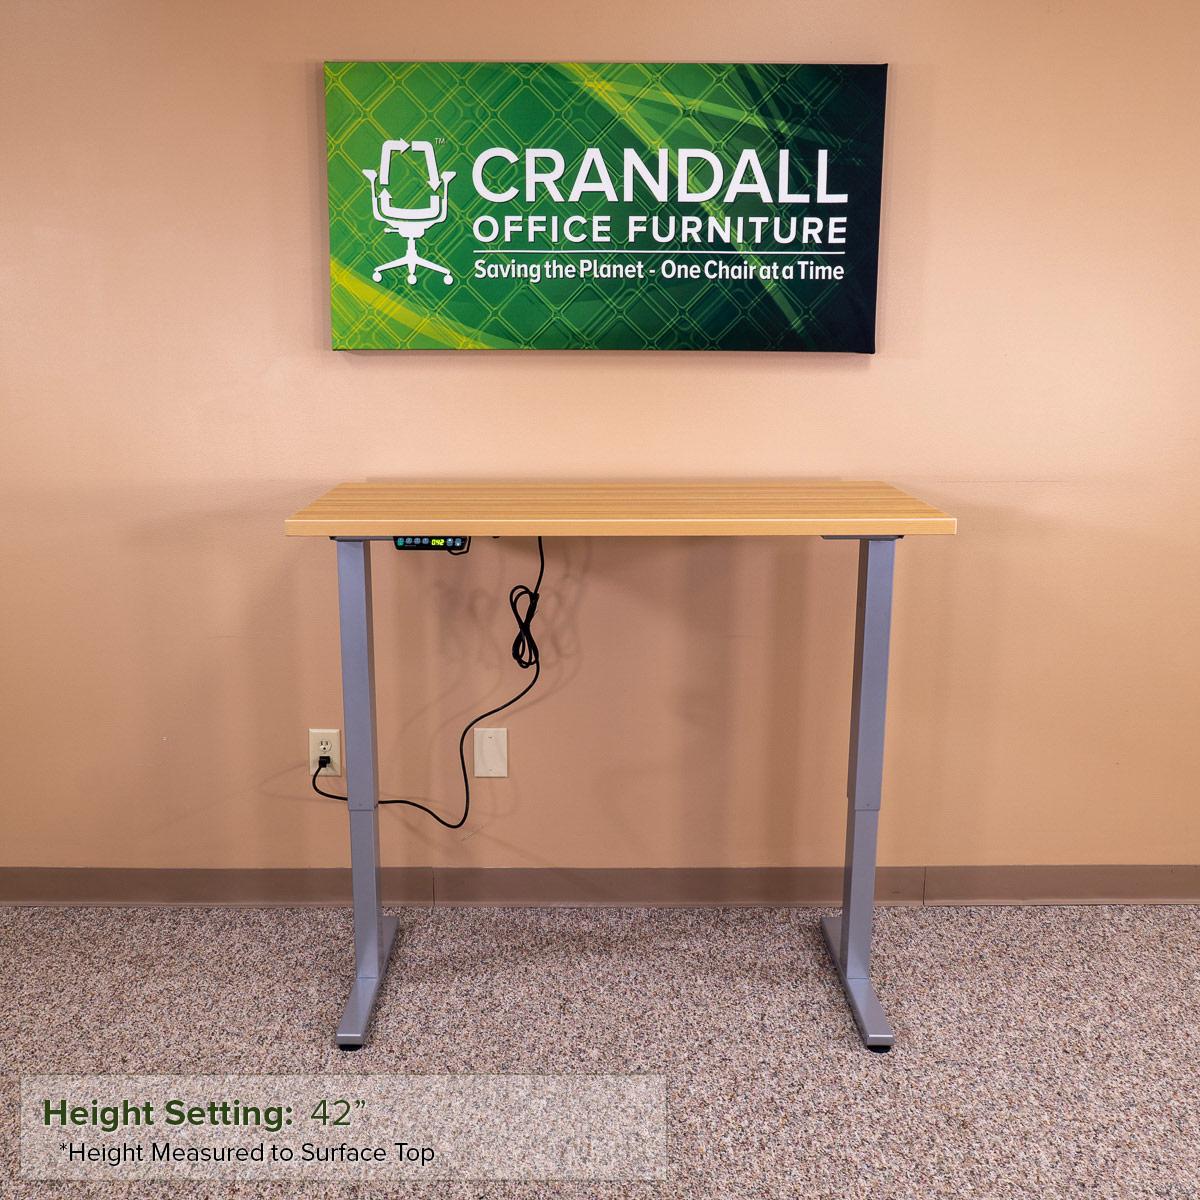 Crandall-Office-Furniture-ErgomatIQ Height-Adjustable-Desk-013